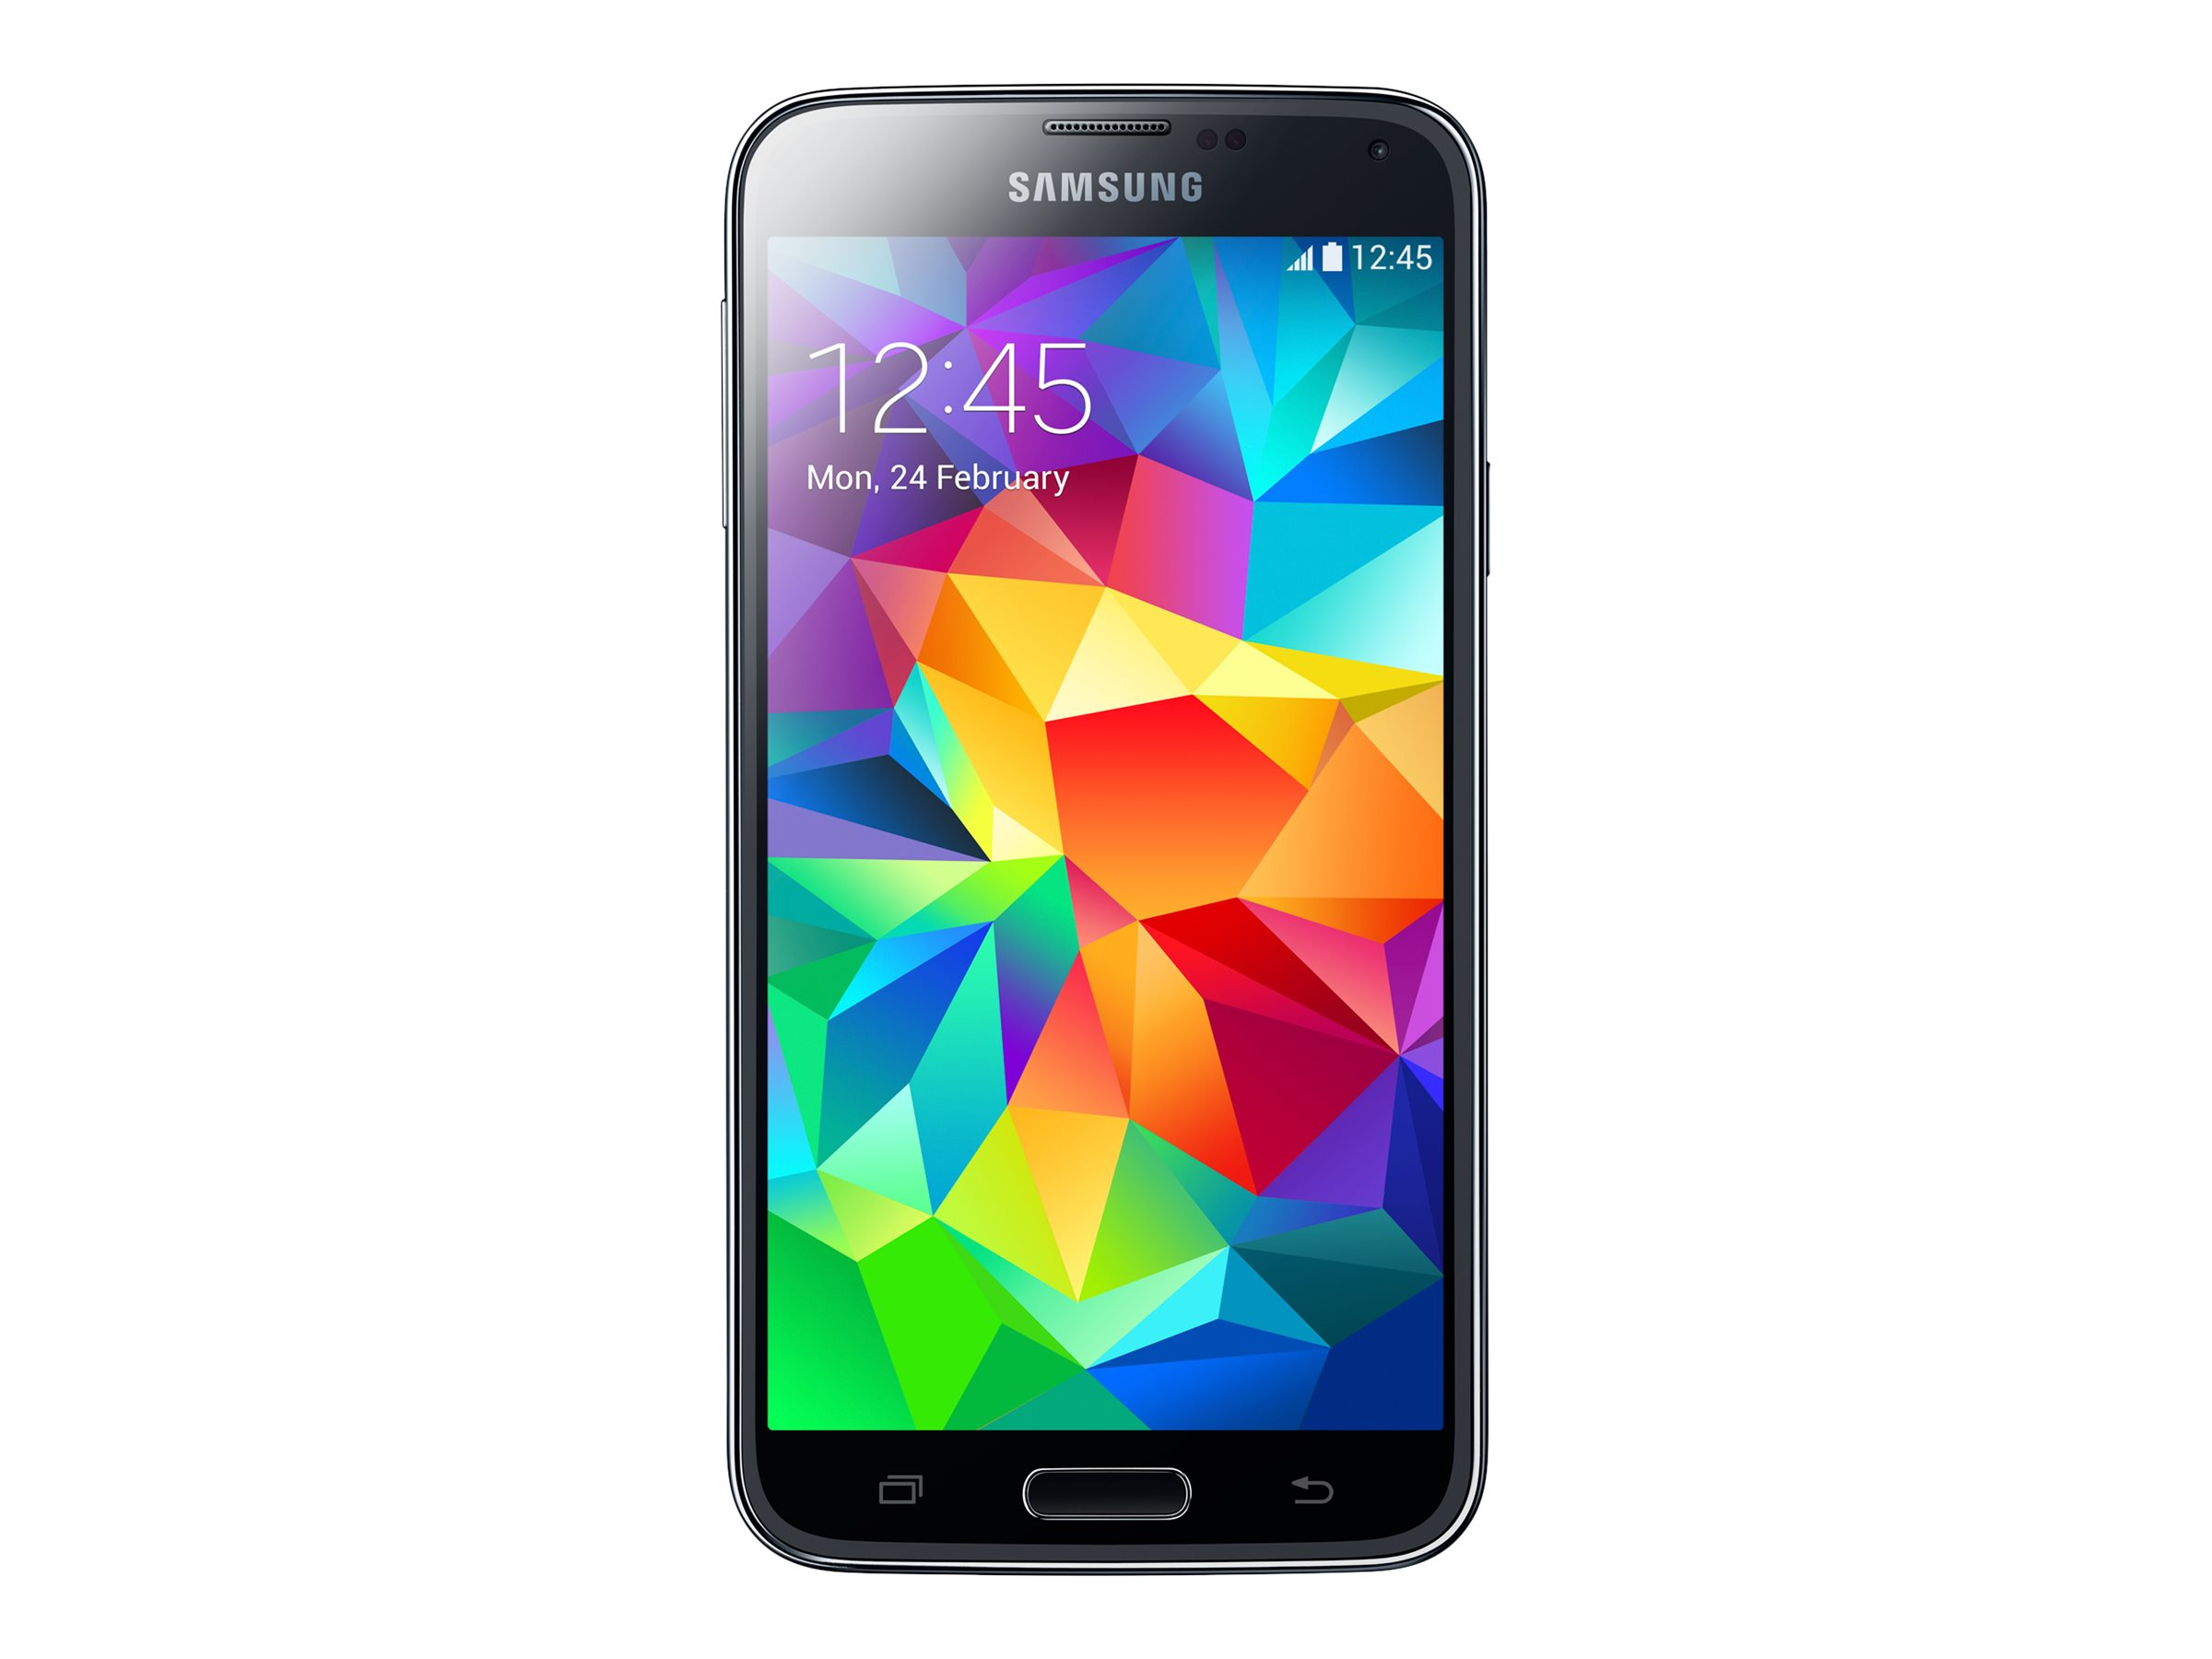 Samsung Galaxy S5 Smartphone 4g Lte 16 Gb Microsdxc Slot Grand Prime Quad Core 12 Ghz Processor 8 Mp Camera Android Kitkat Ready Gsm 51 1920 X 1080 Pixels 432 Ppi Super Amoled Ram 2 Front